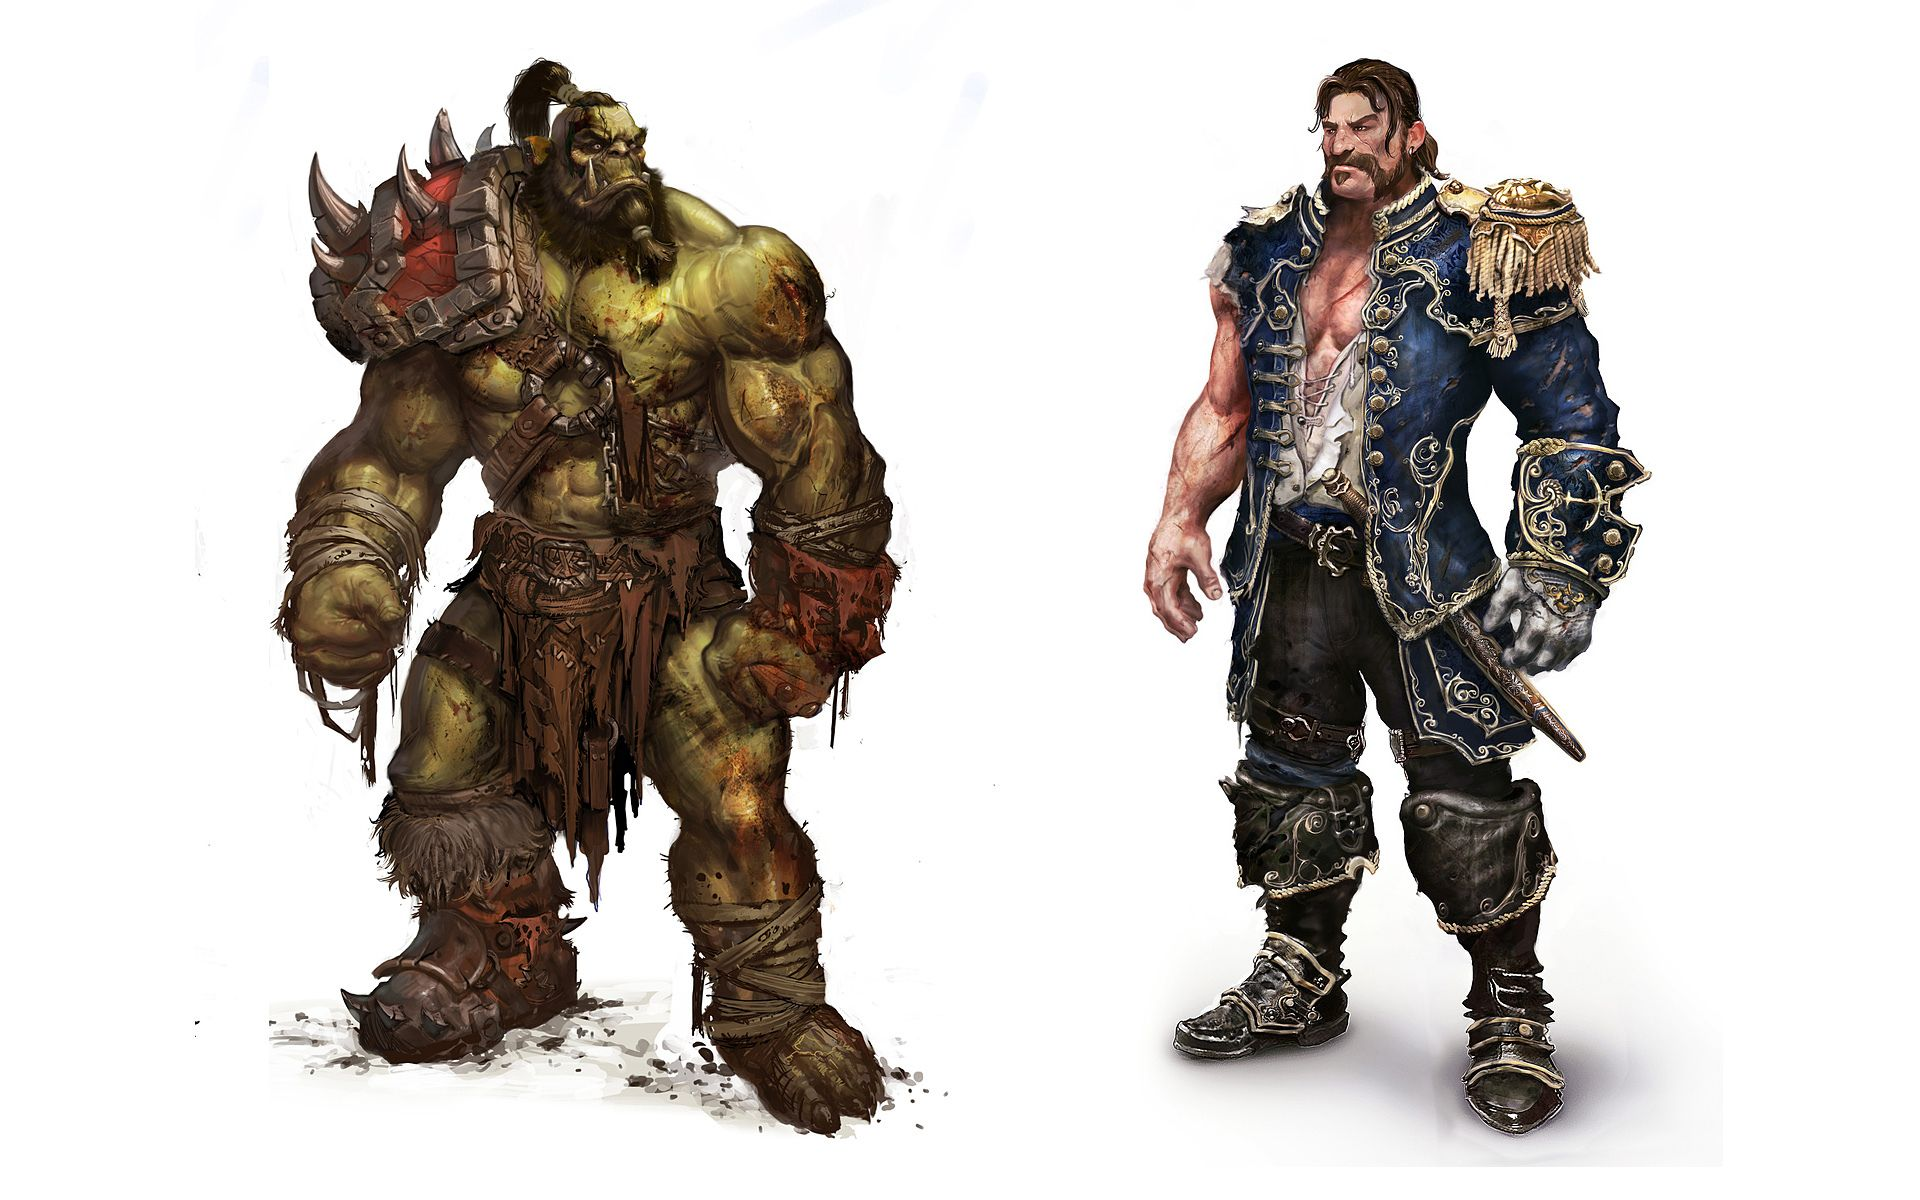 Orc Warrior Human Admiral Jpg 1920 1200 World Of Warcraft